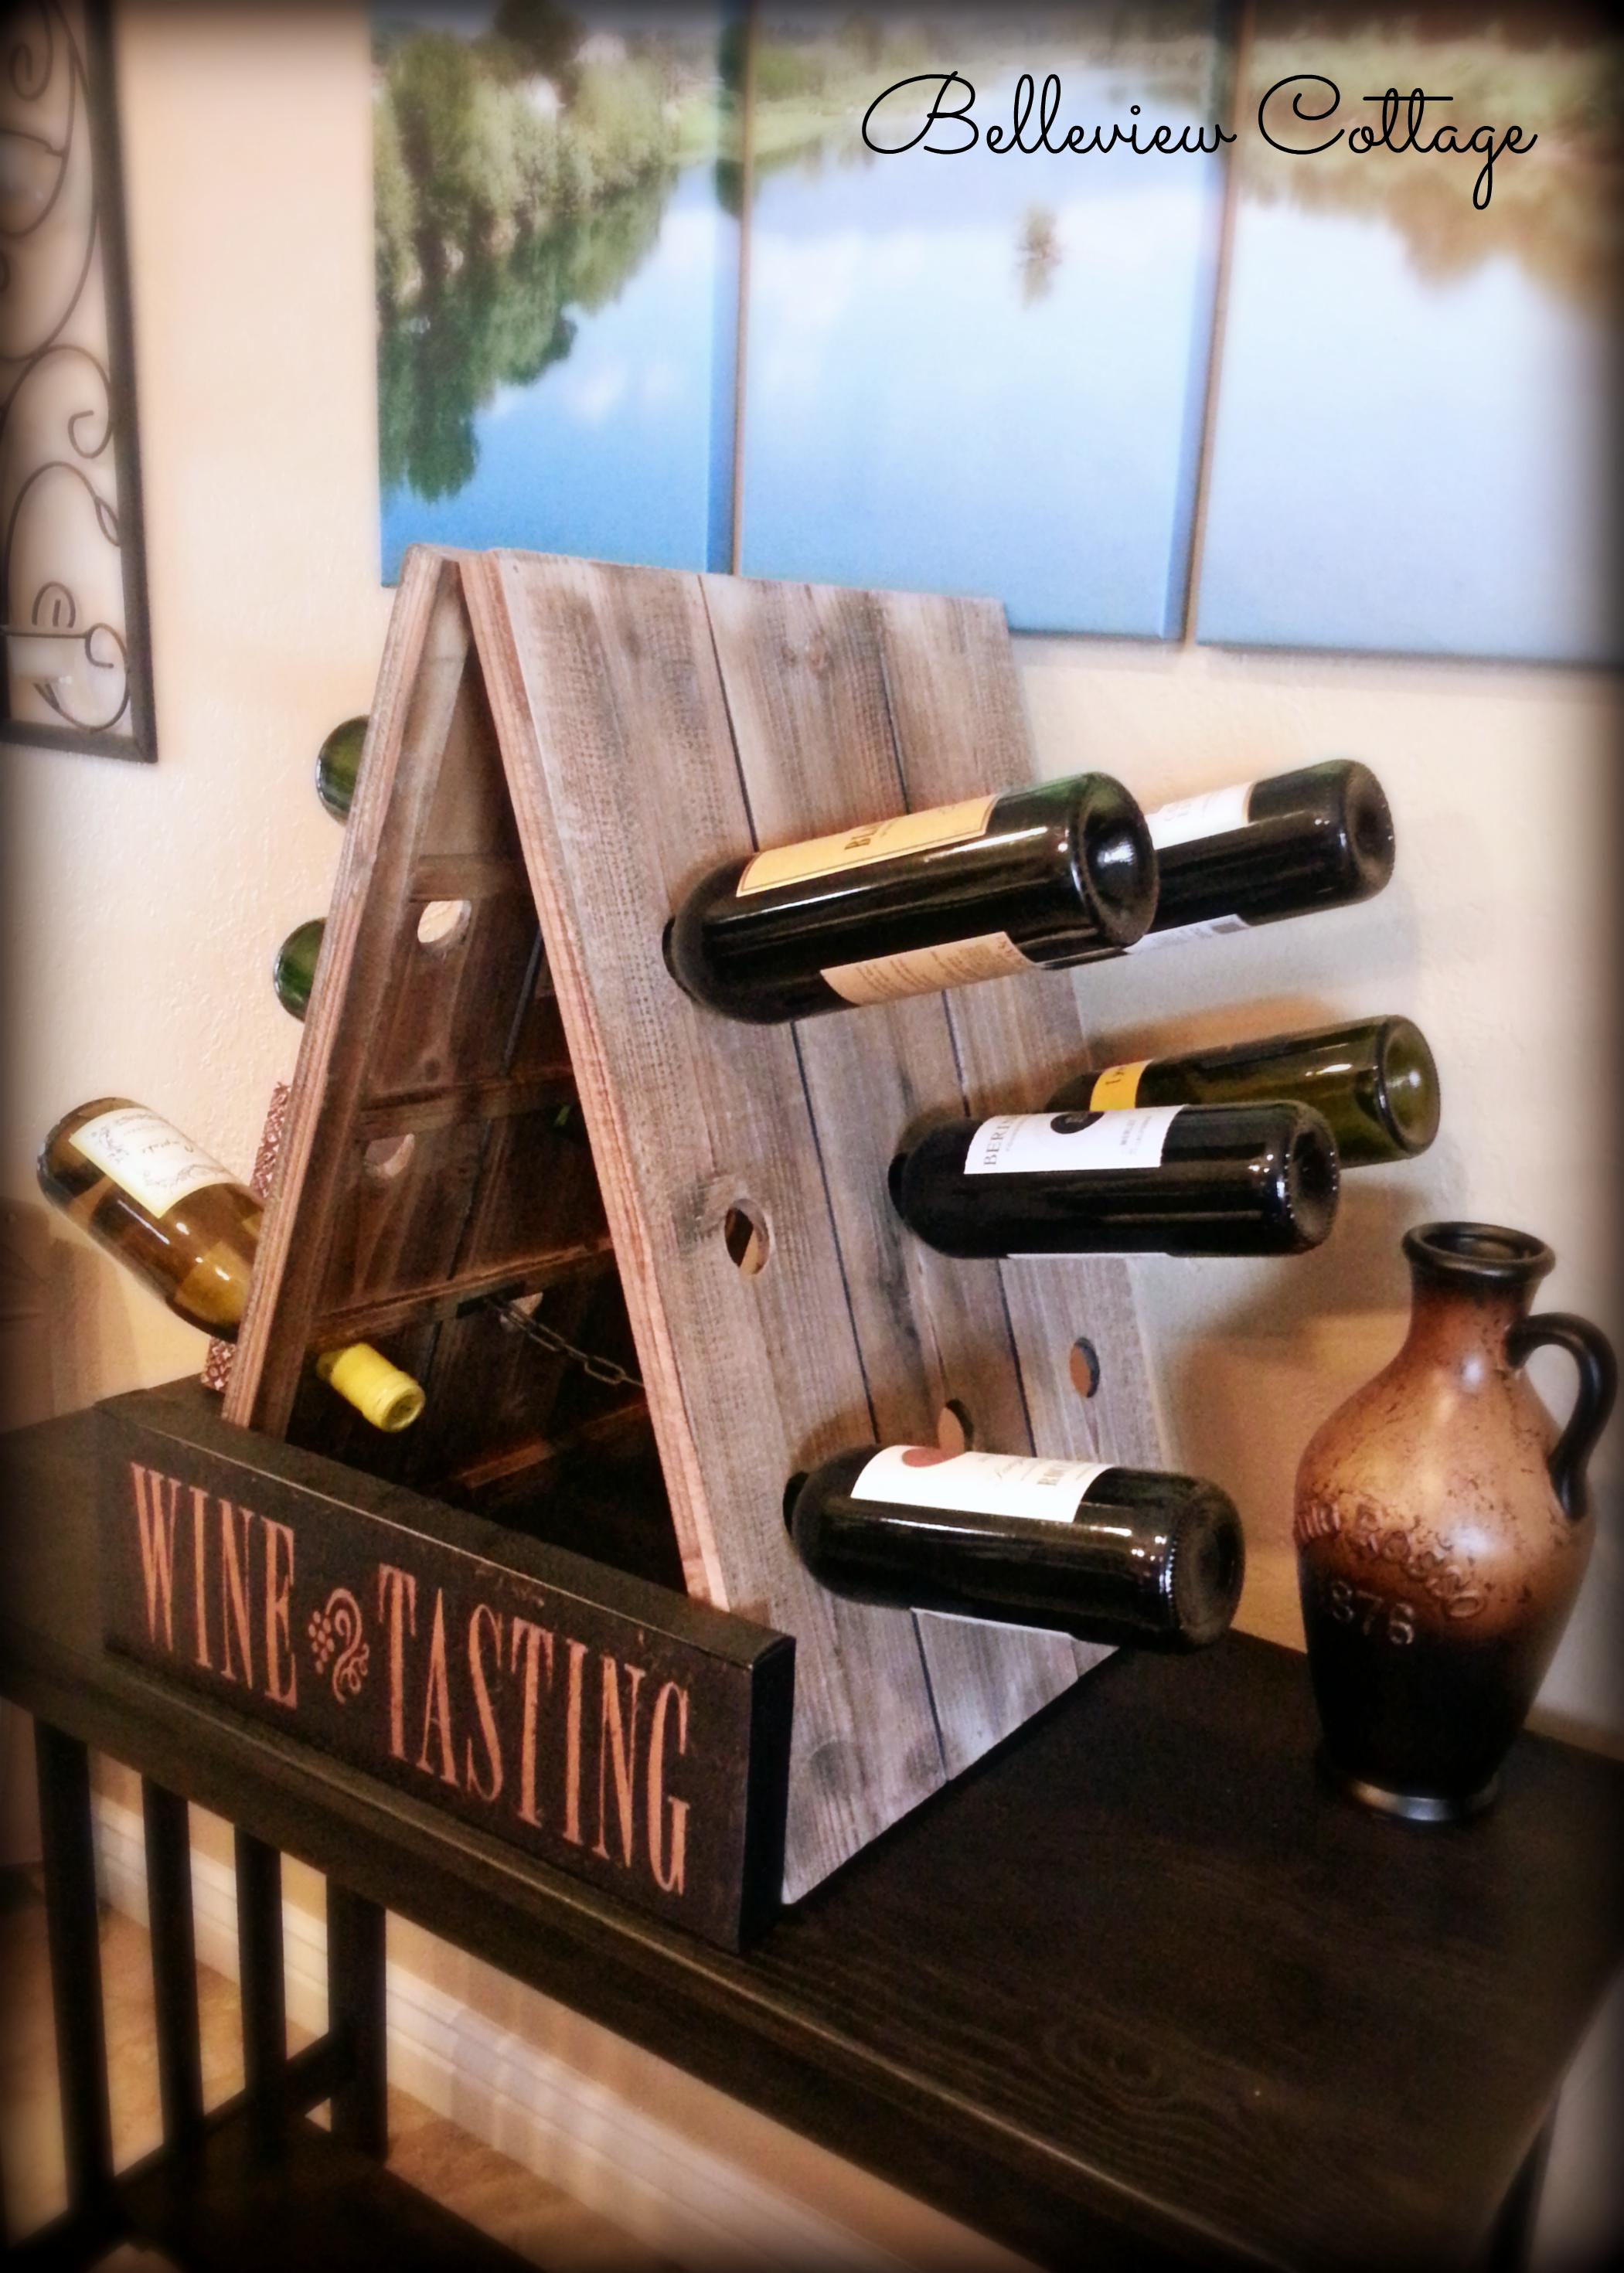 Wine lattice and glass moldings